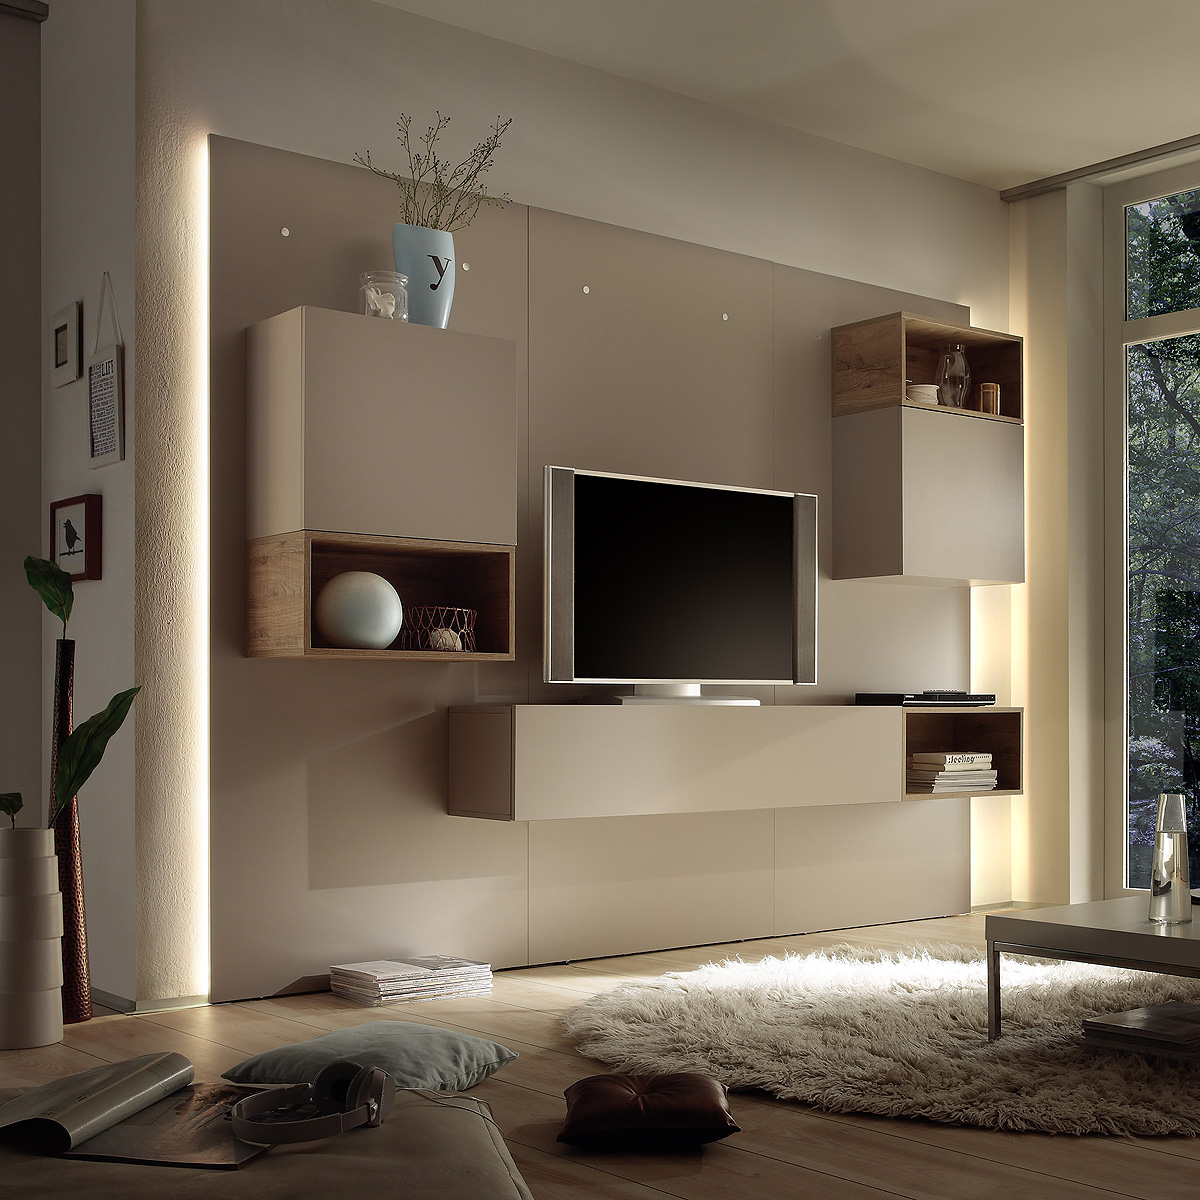 wohnwand cube 2 kombi 3 anbauwand wohnkombi in beige matt. Black Bedroom Furniture Sets. Home Design Ideas